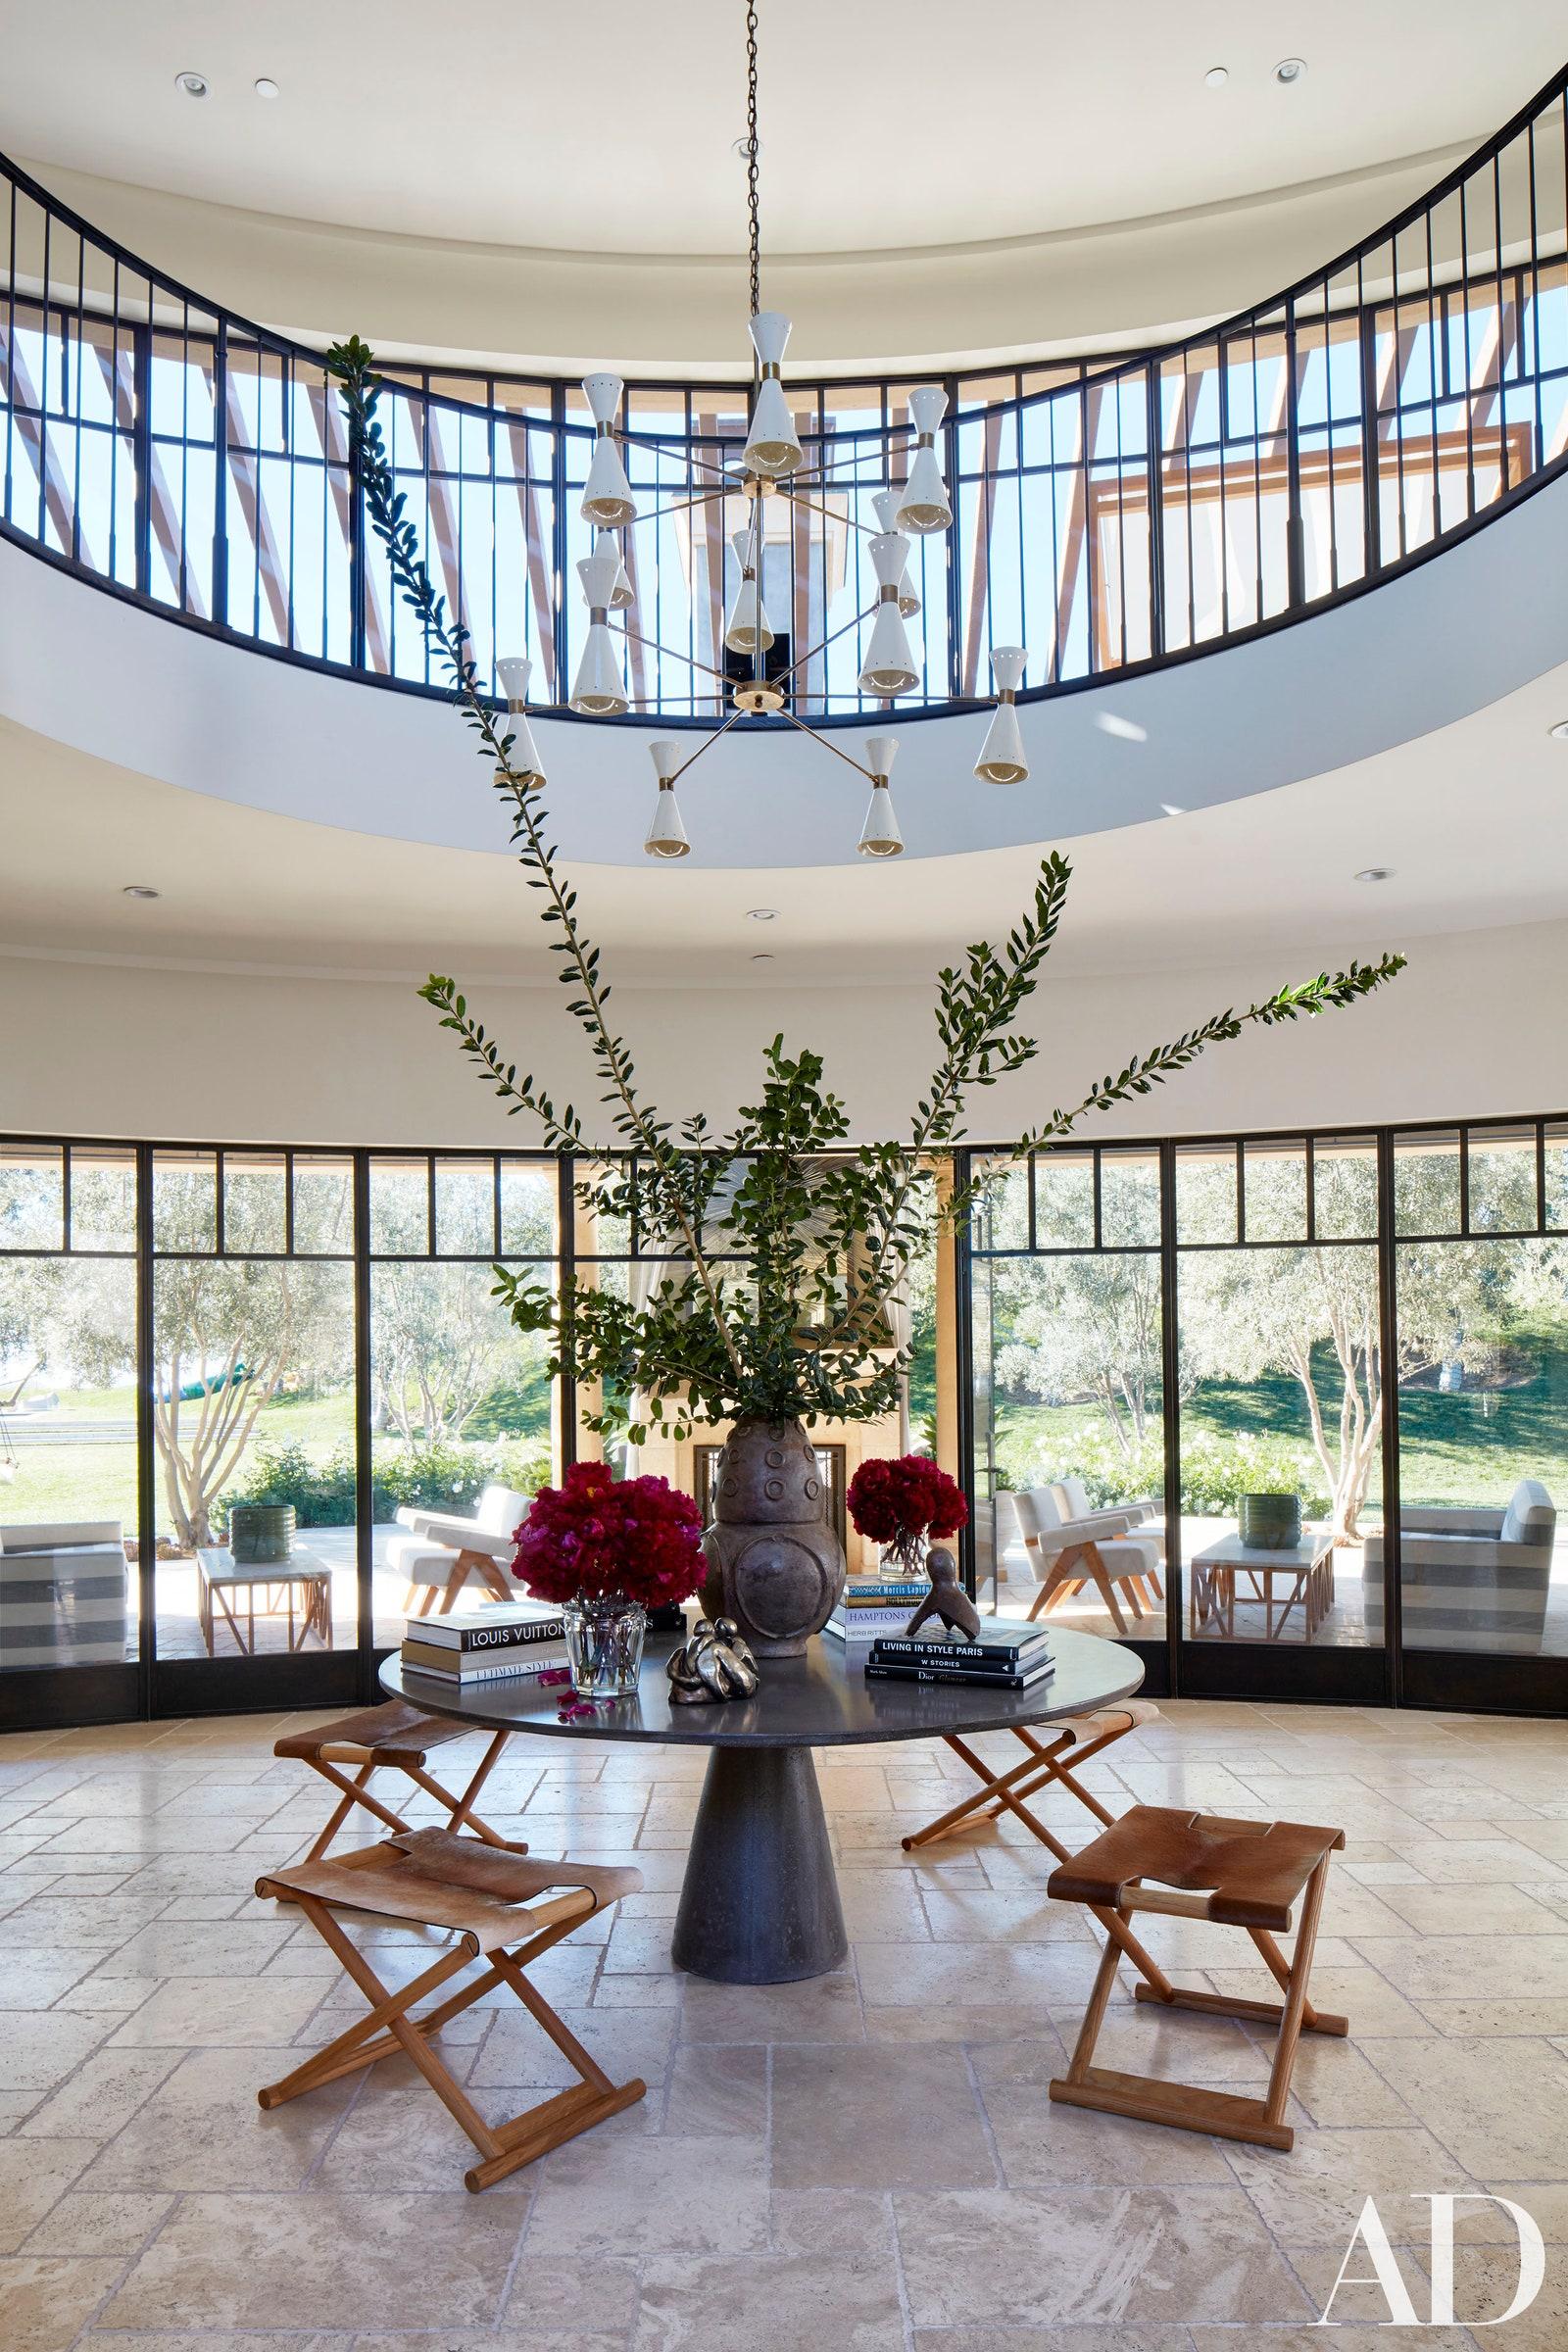 kourtney kardashian house design Home Design Get Kourtney Kardashian House Design Background